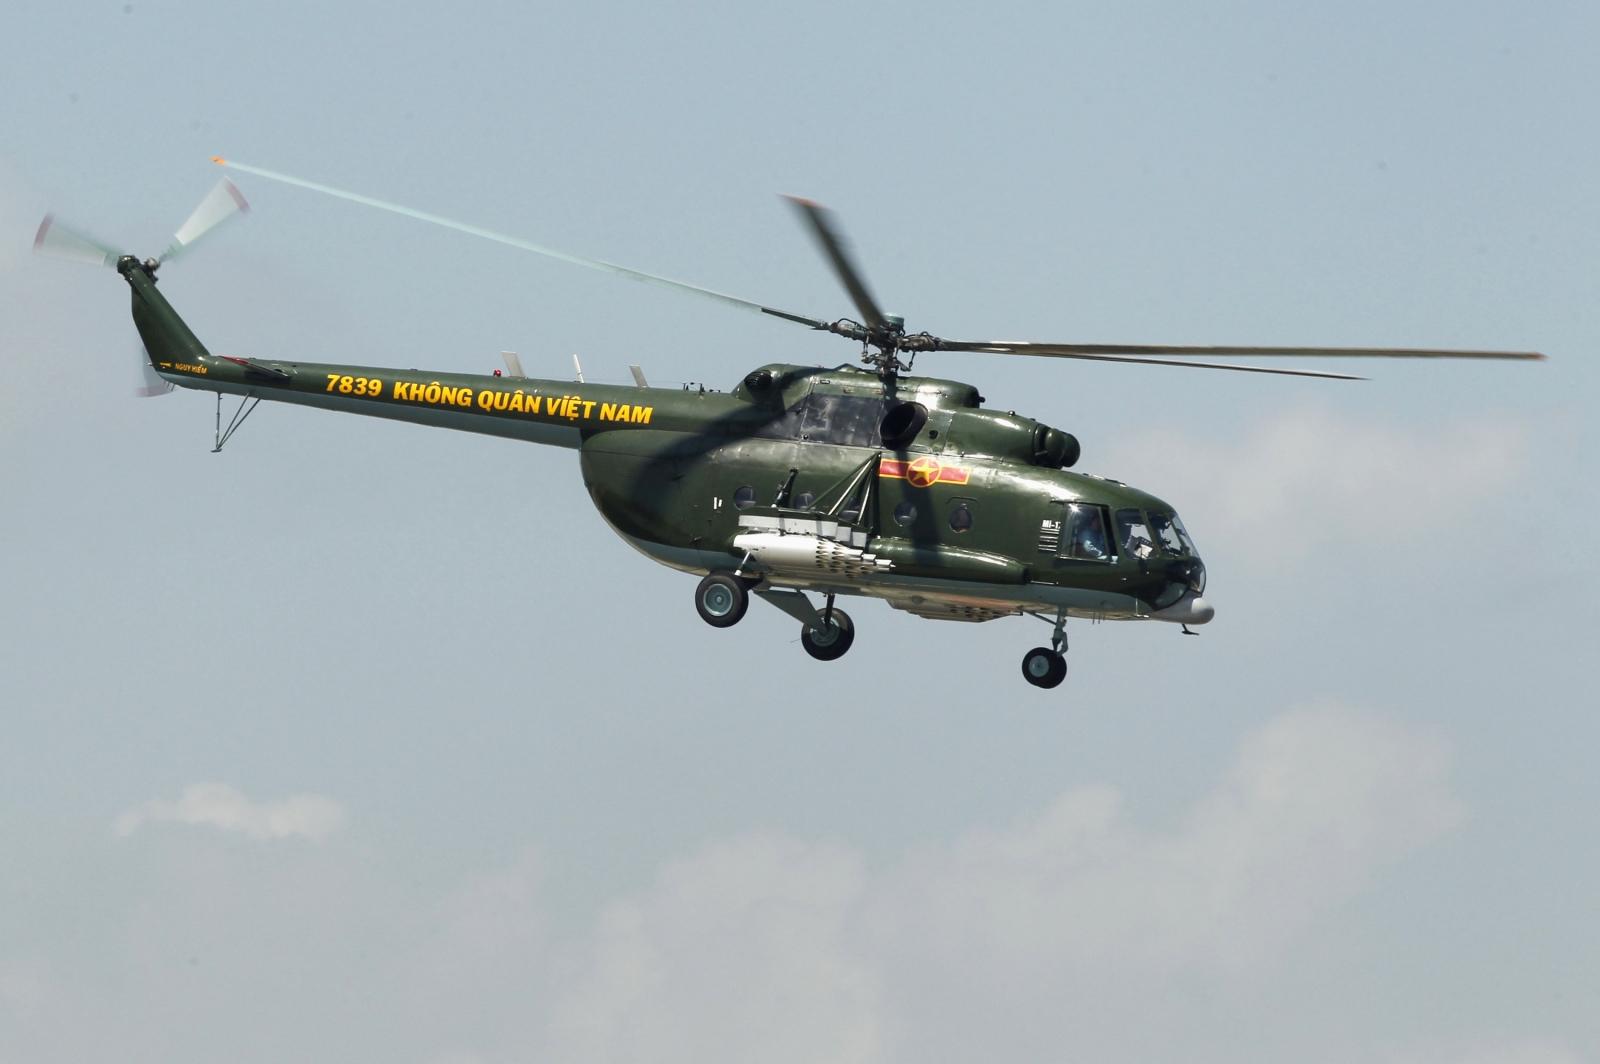 Vietnam helicopter crash